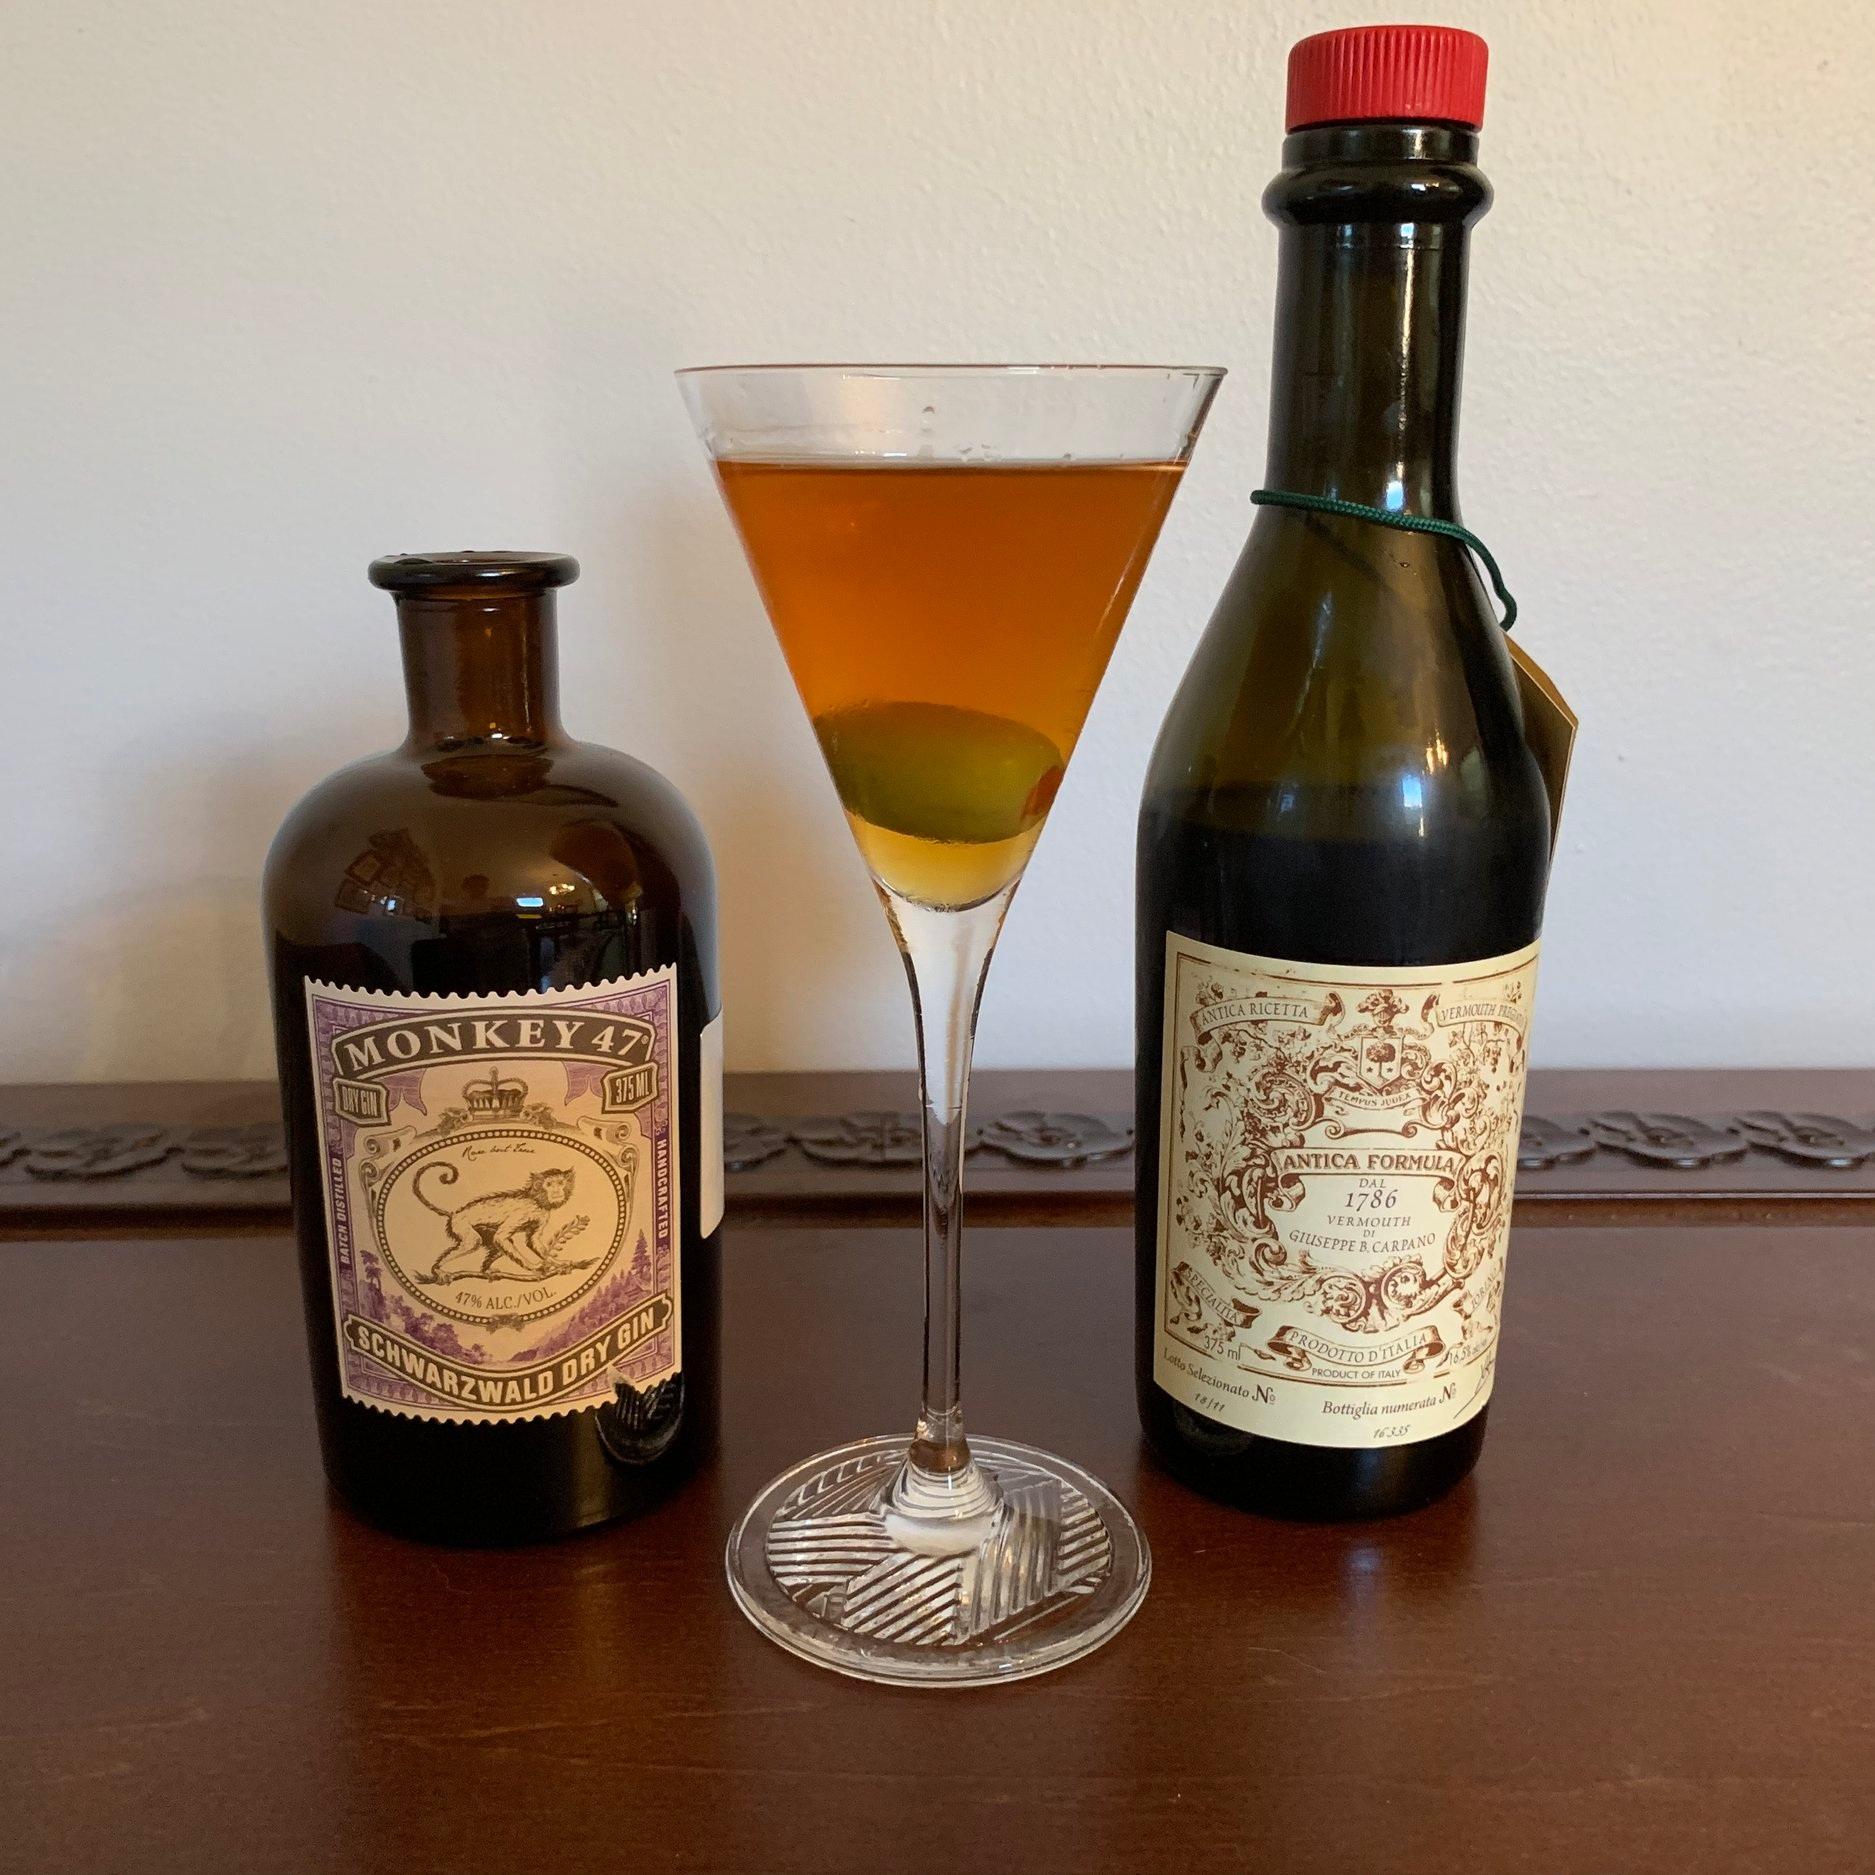 Dirty Martini—Gina Style